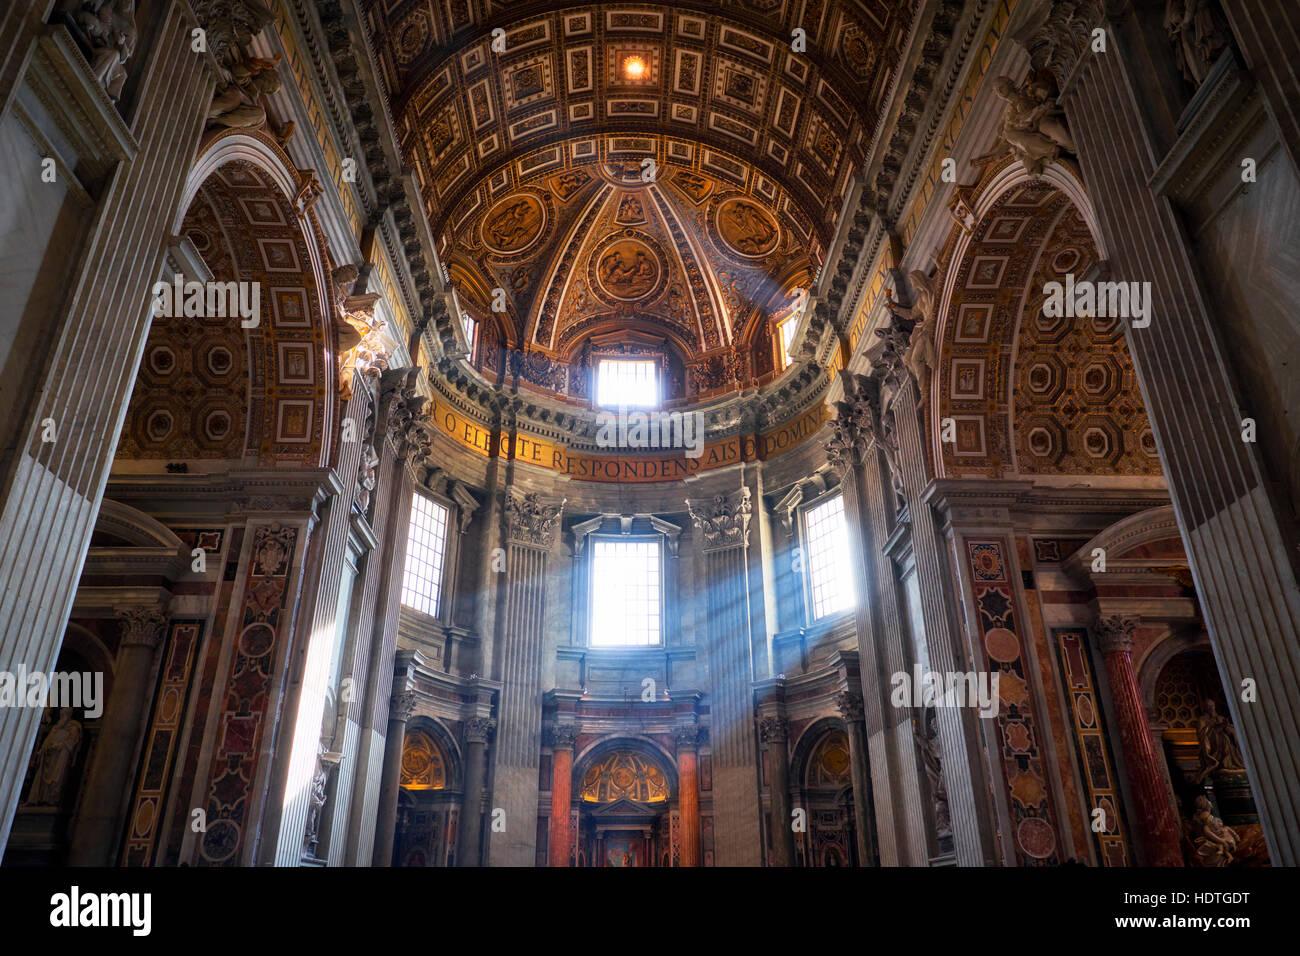 Roma, Italia - Jan 12, 2016: En el interior de la basílica de San Pedro (San Pietro). Imagen De Stock